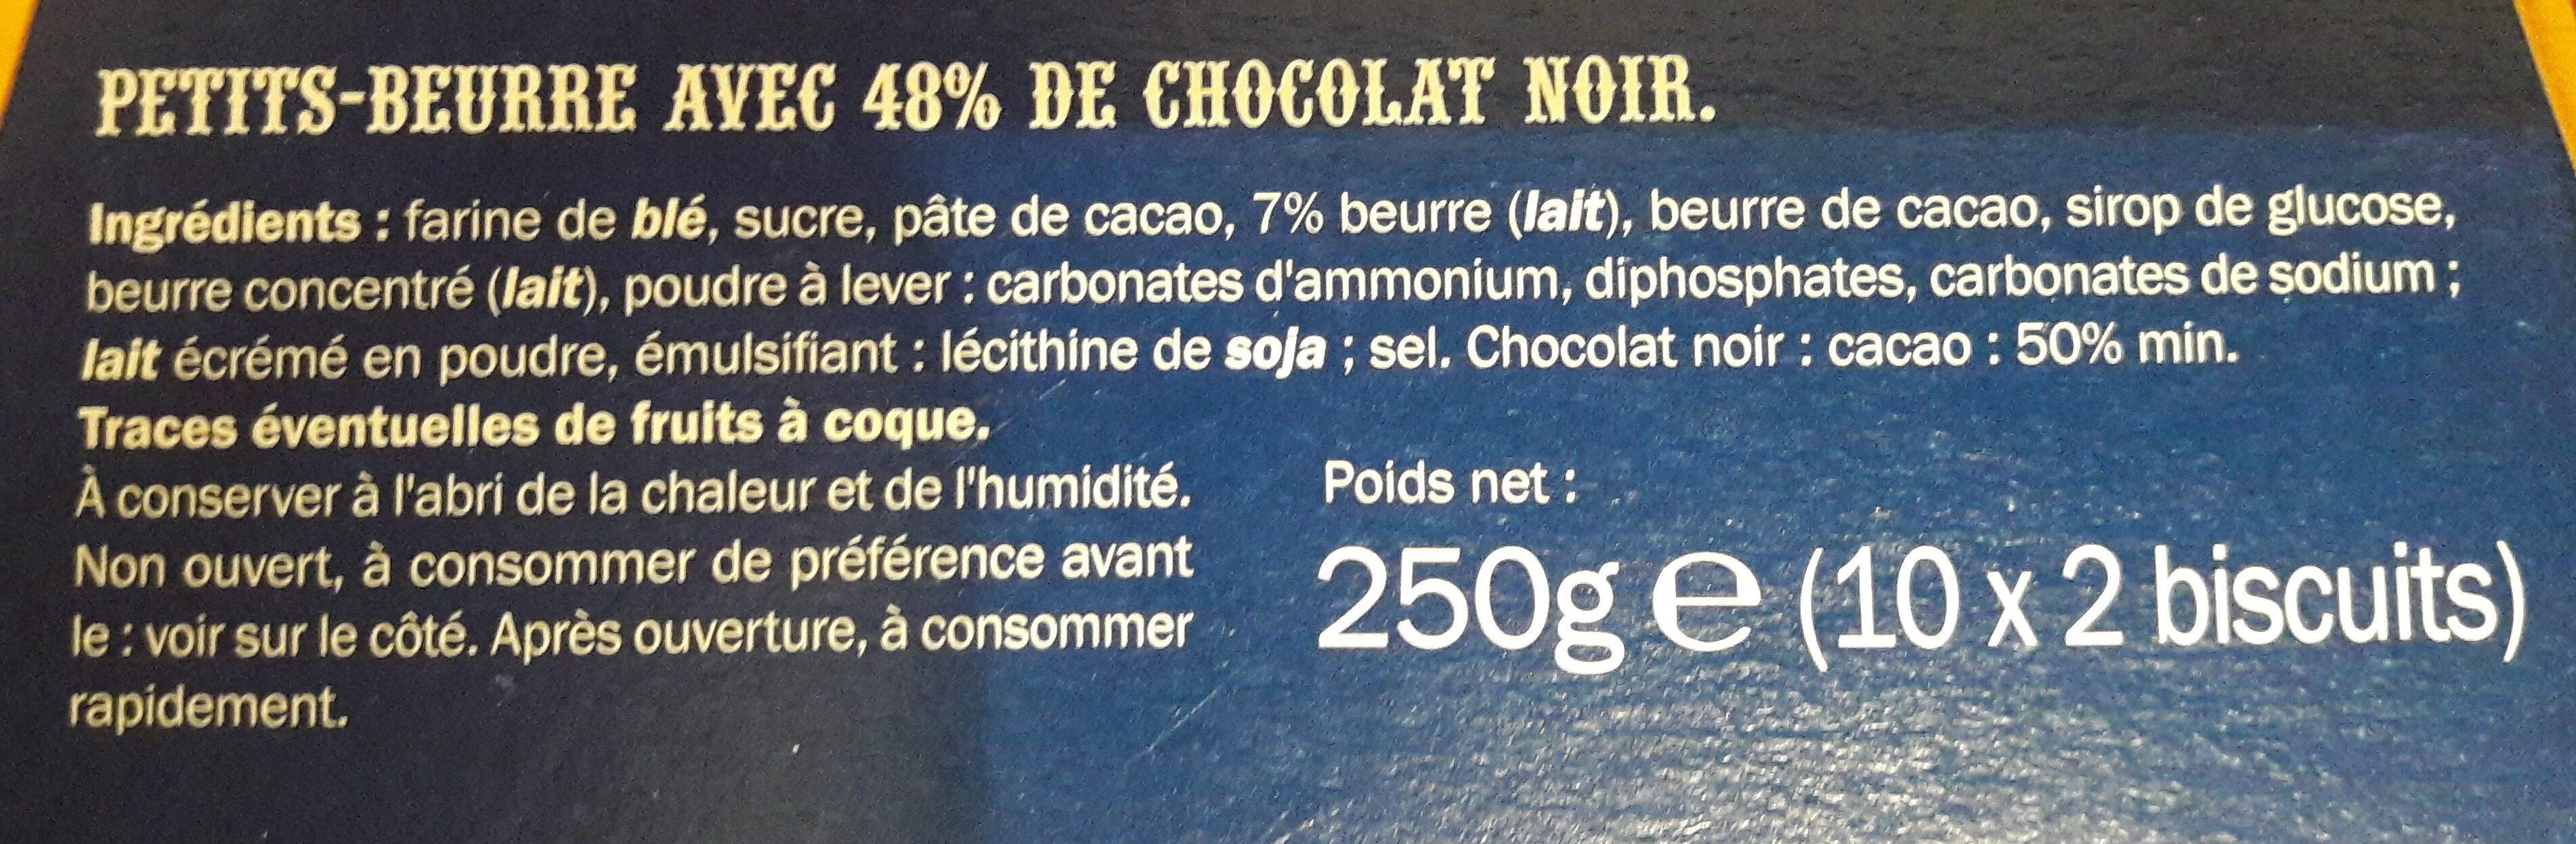 Petit-beurre tablette chocolat noir - Ingrediënten - fr